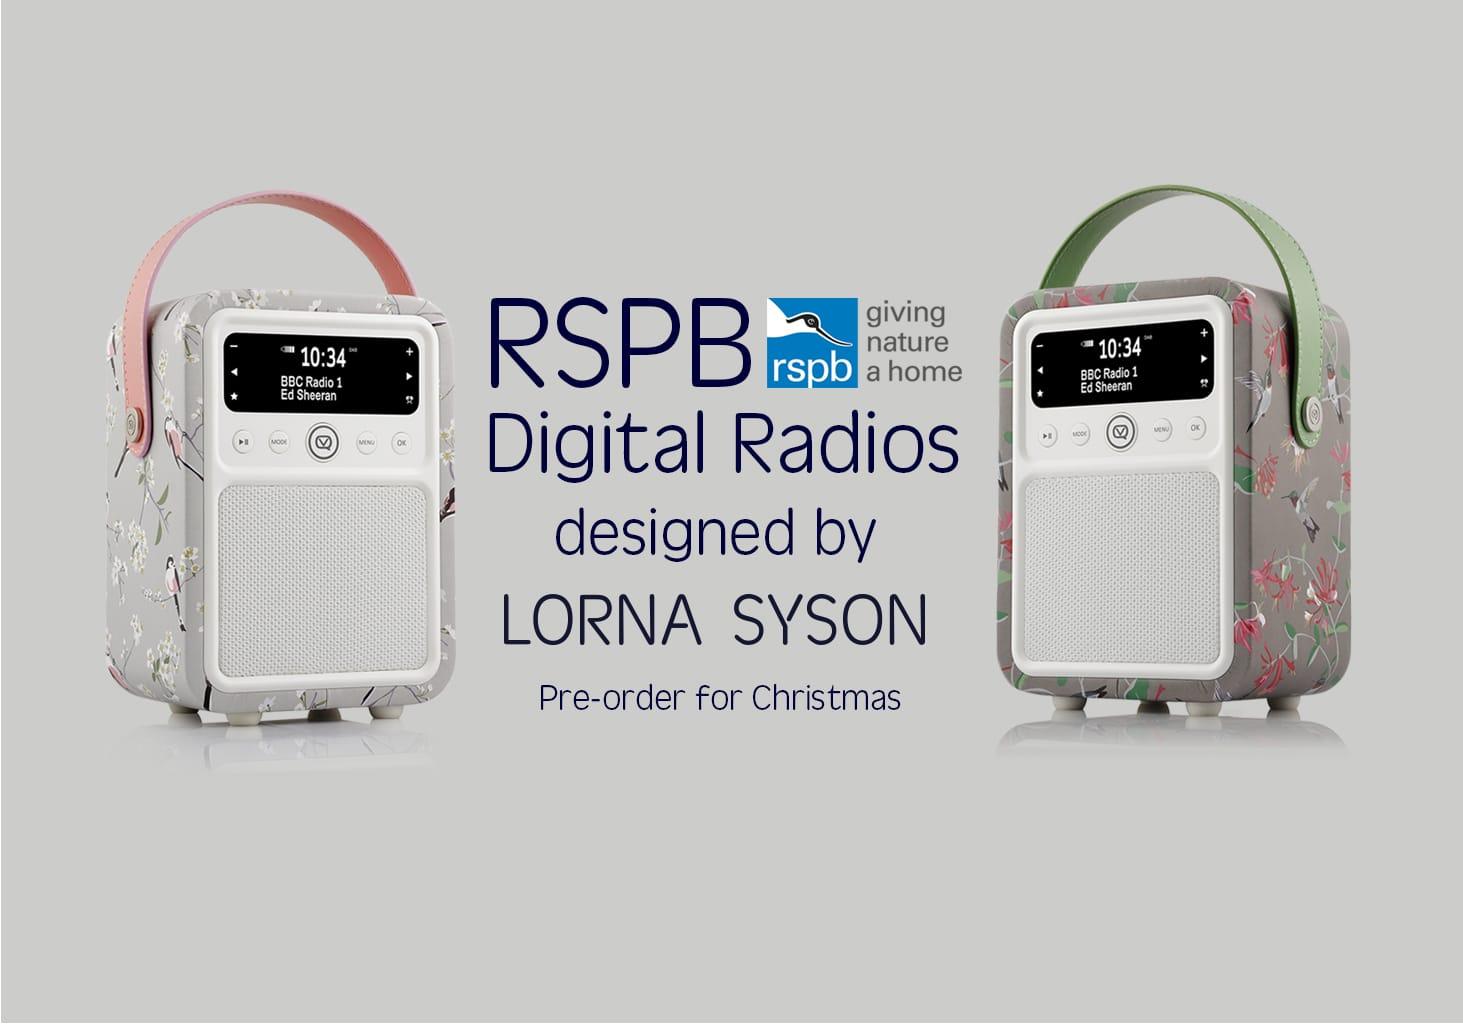 RSPB digital radios